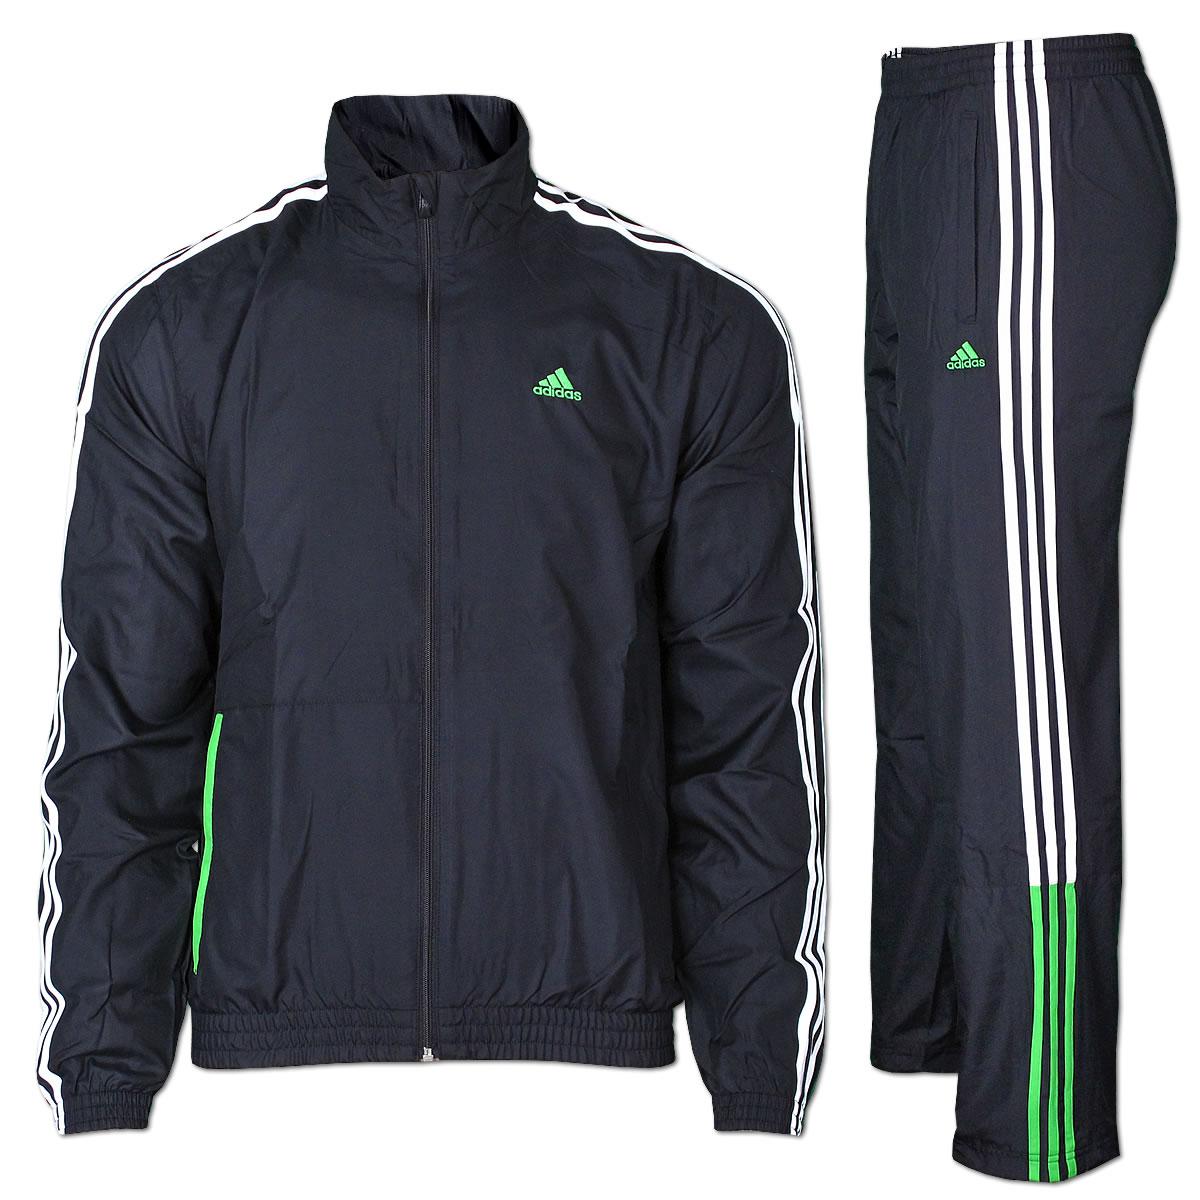 Herren Trainingsanzug Jogginganzug von Adidas M